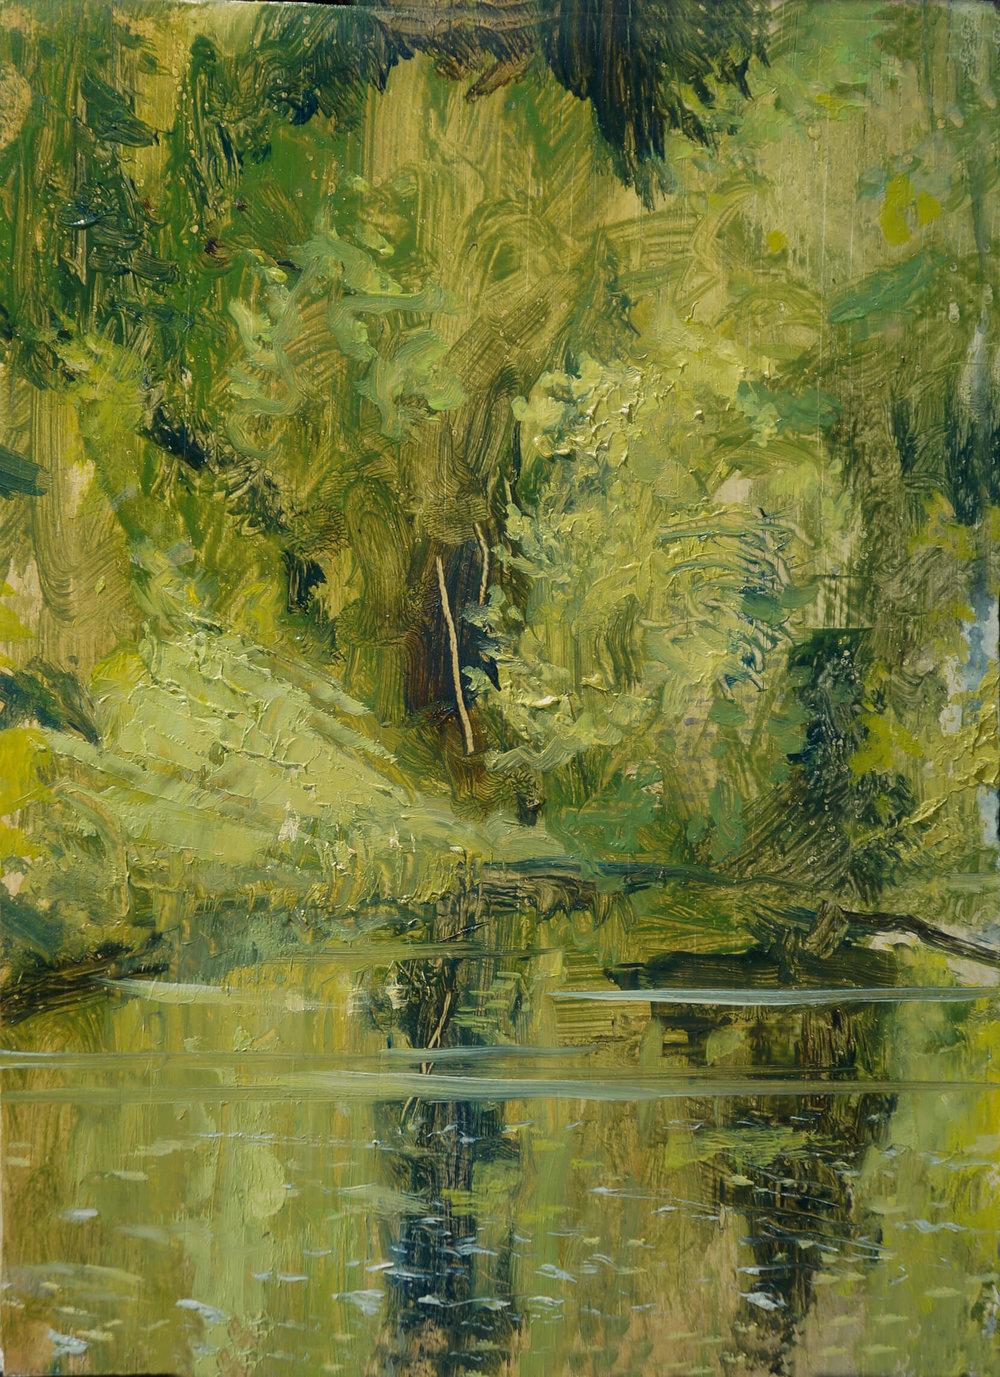 RHSK012 Lake Matsubarako Late Summer 2017 ( Oil on Panel ) 20.5 x 16 cm